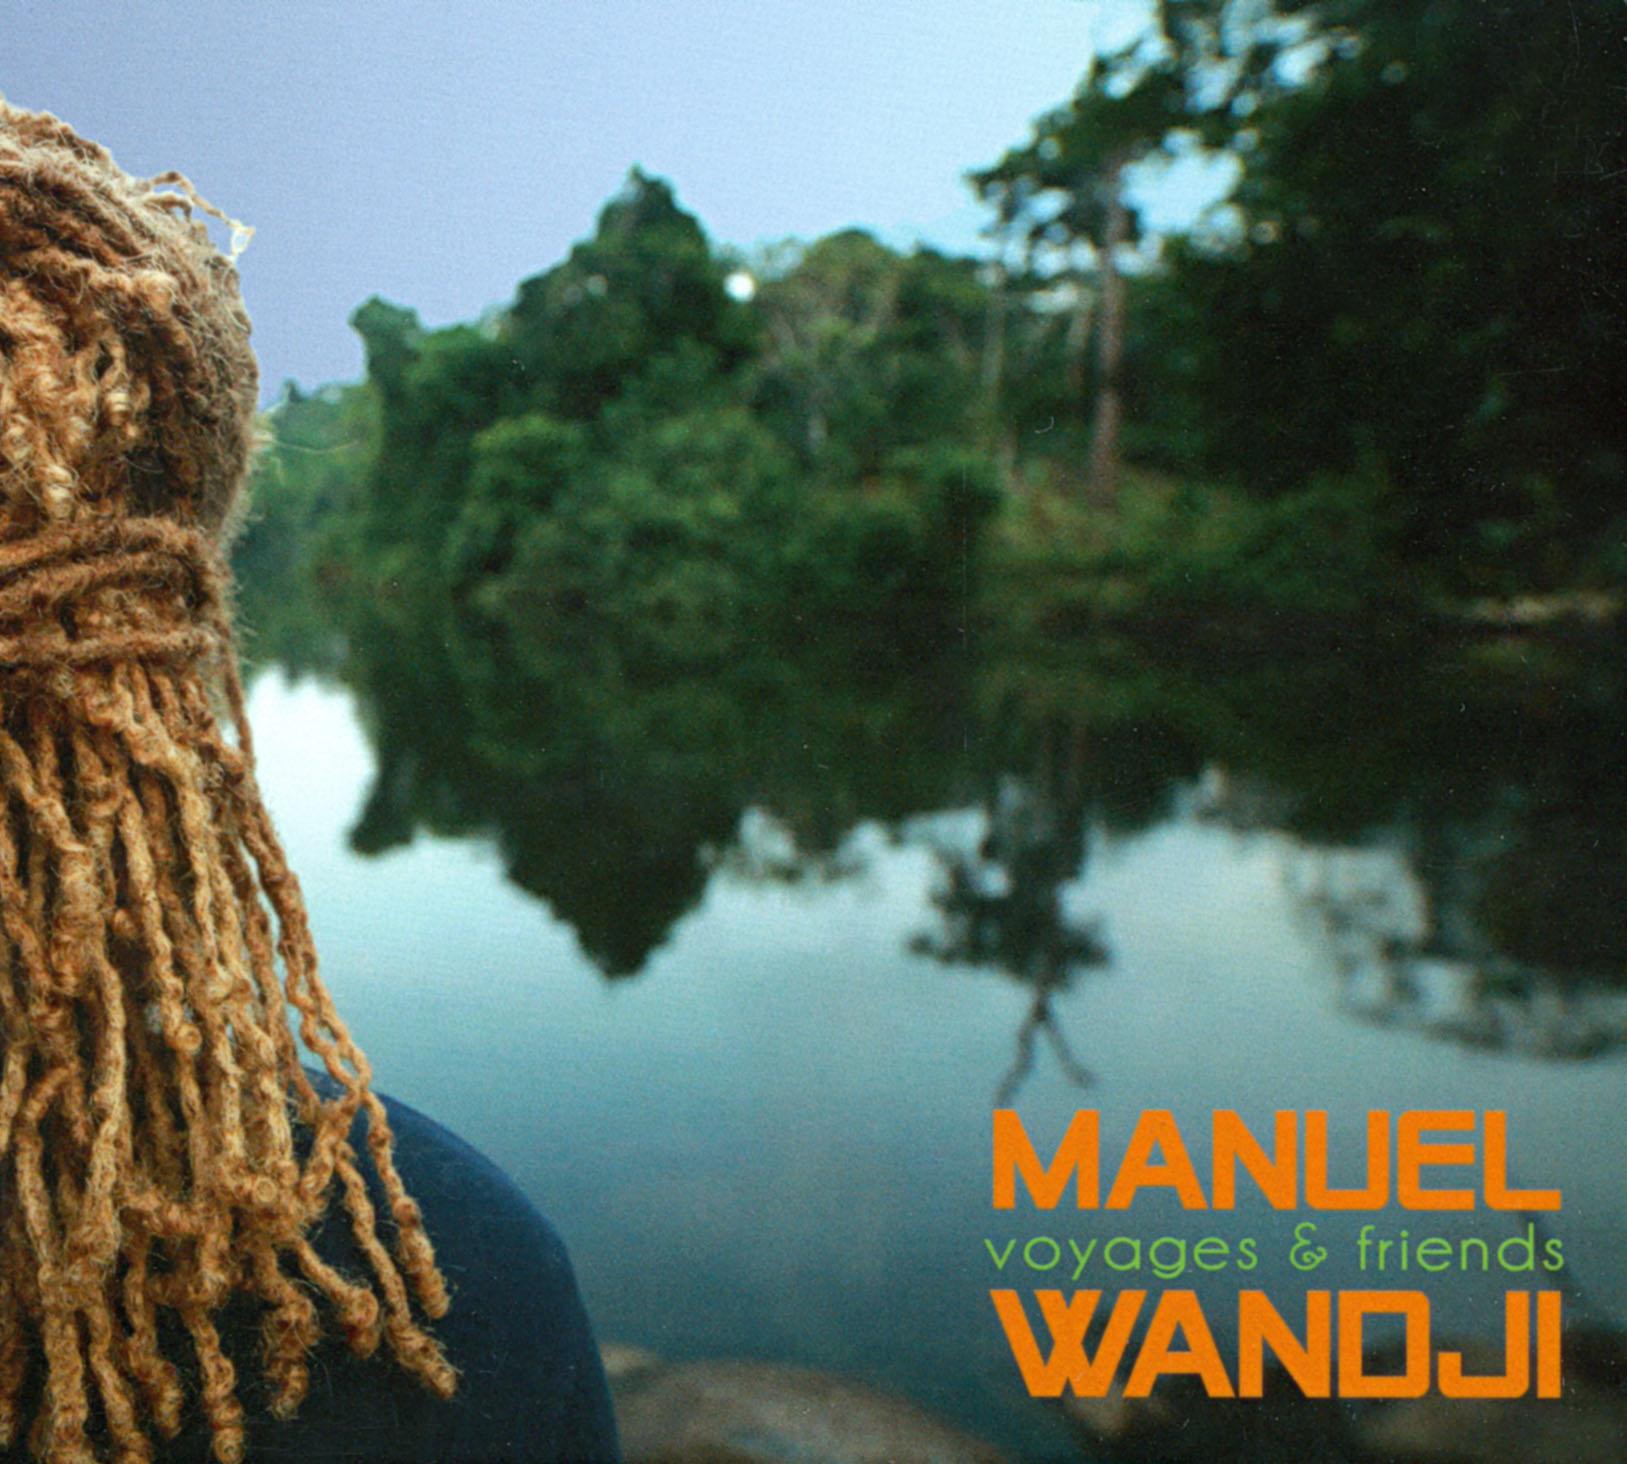 Manuel Wandji: Live at Morteau Theater in France in 2010